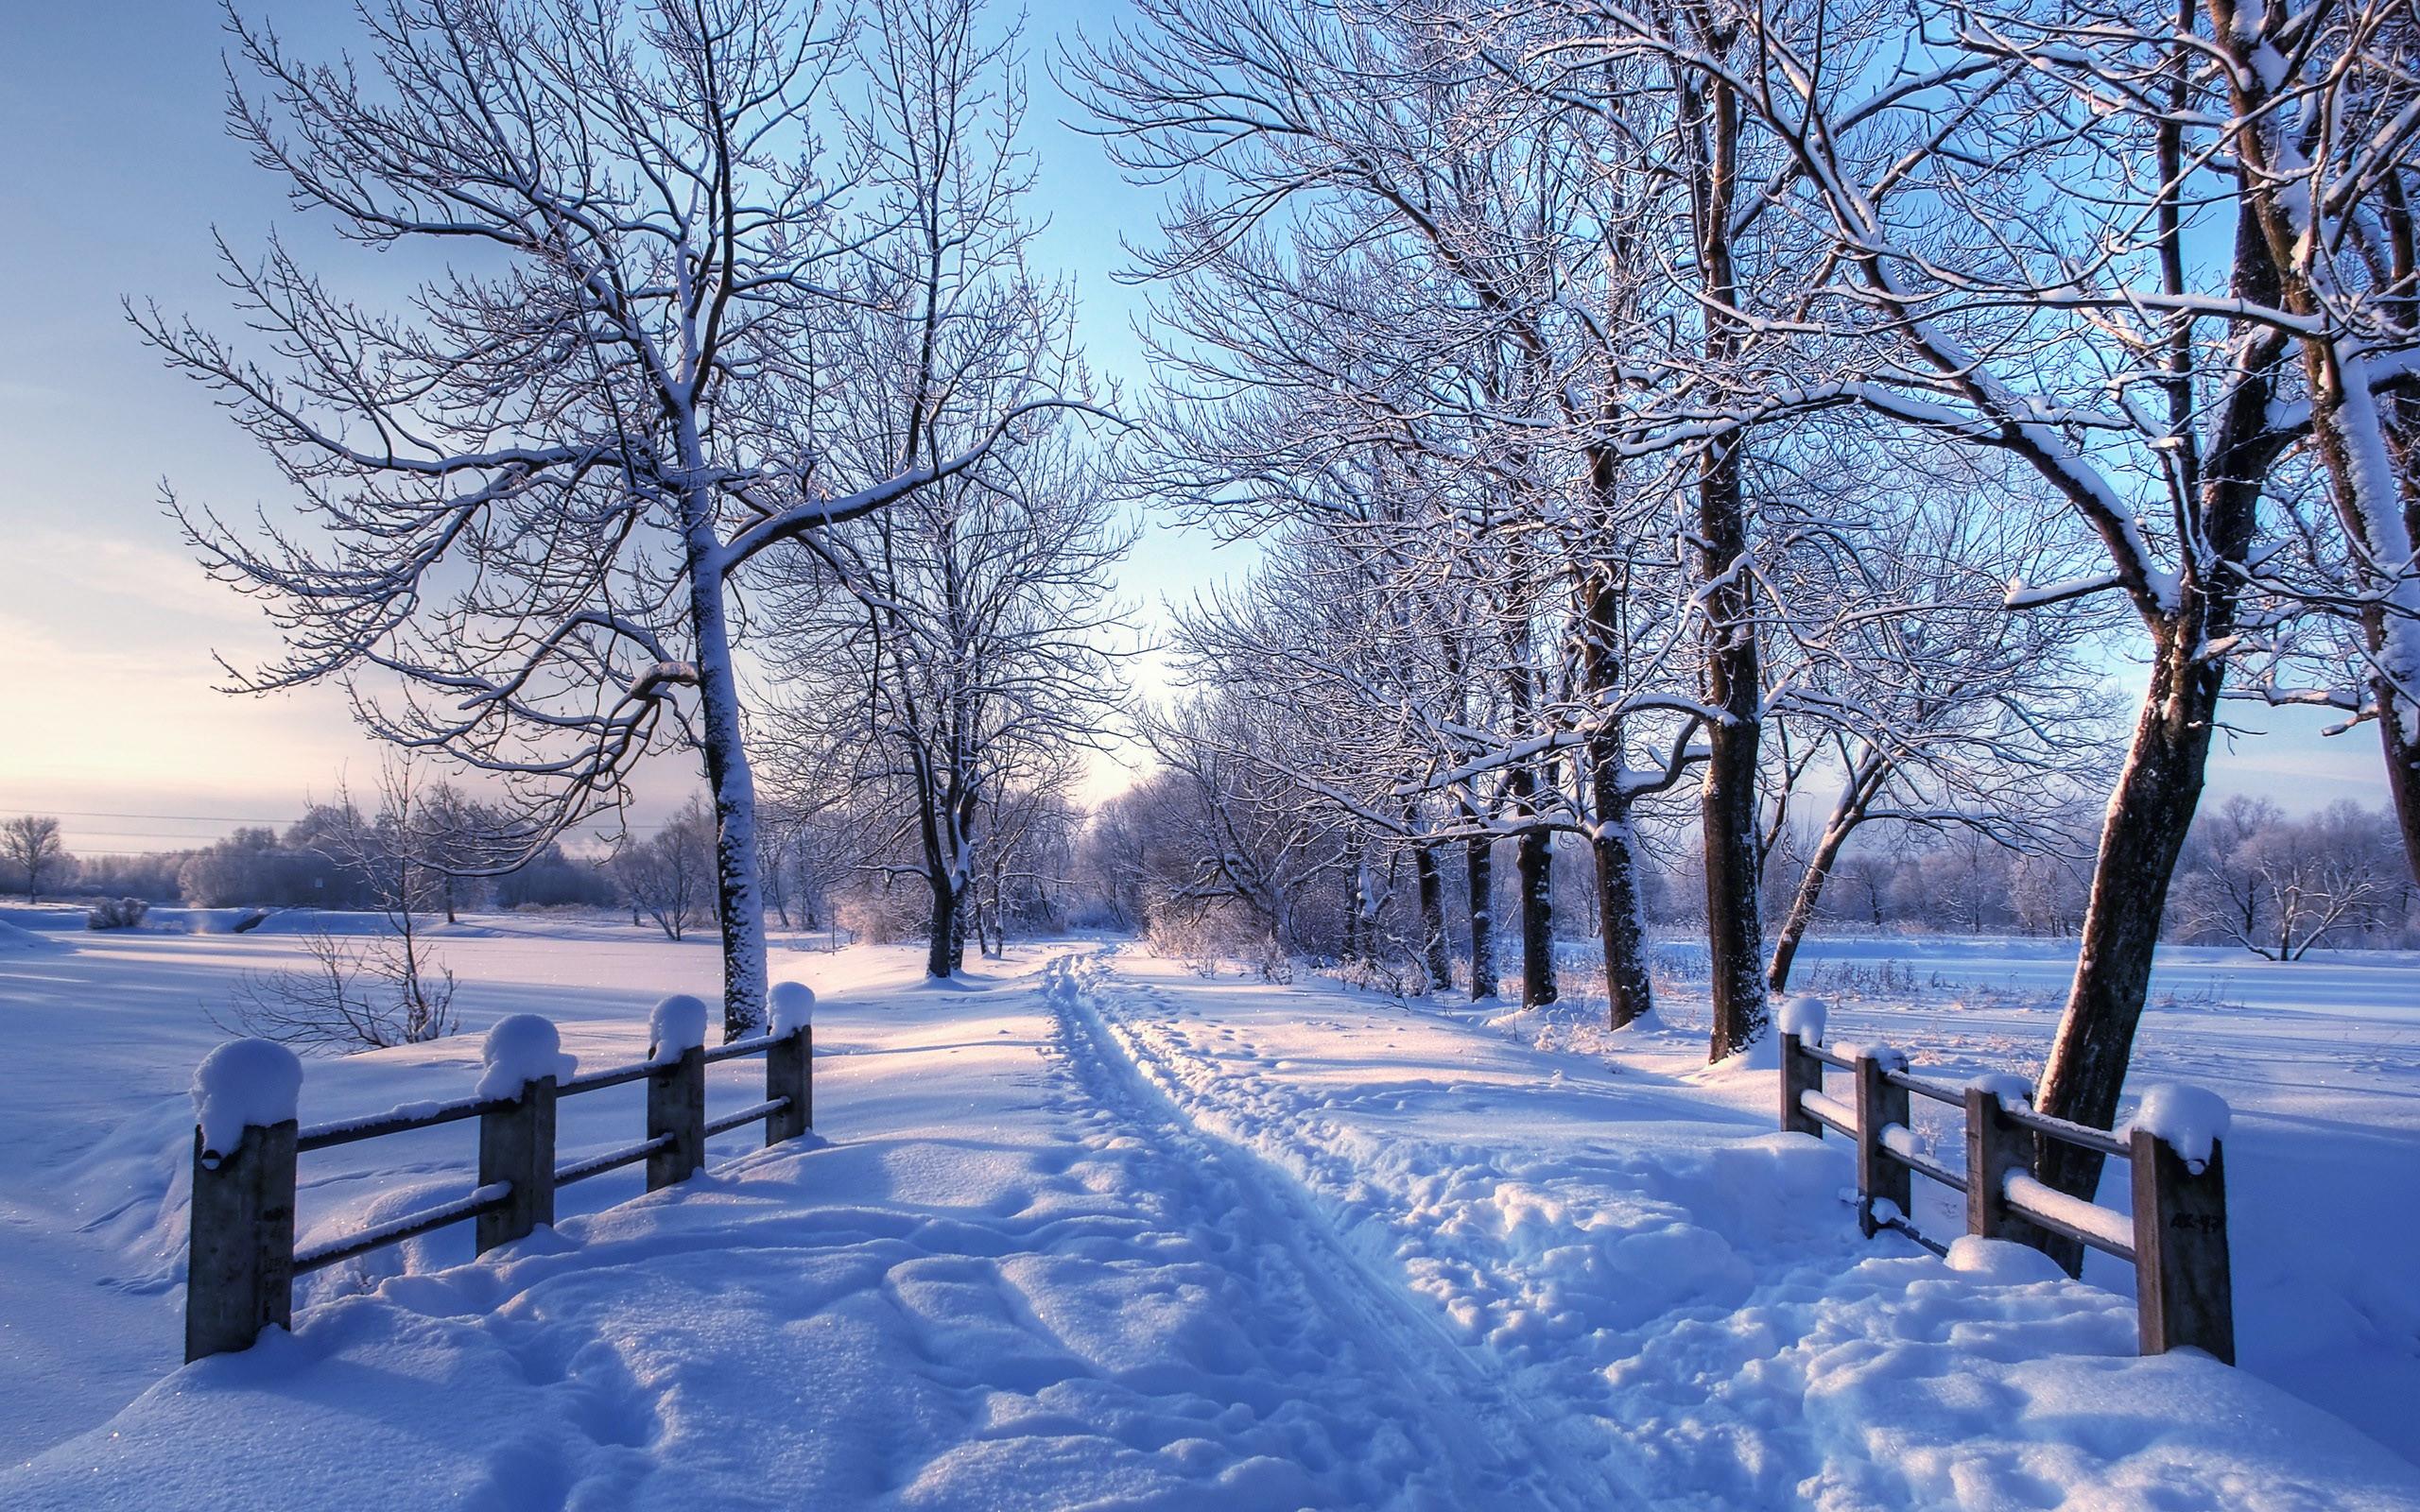 … Snow Desktop Backgrounds